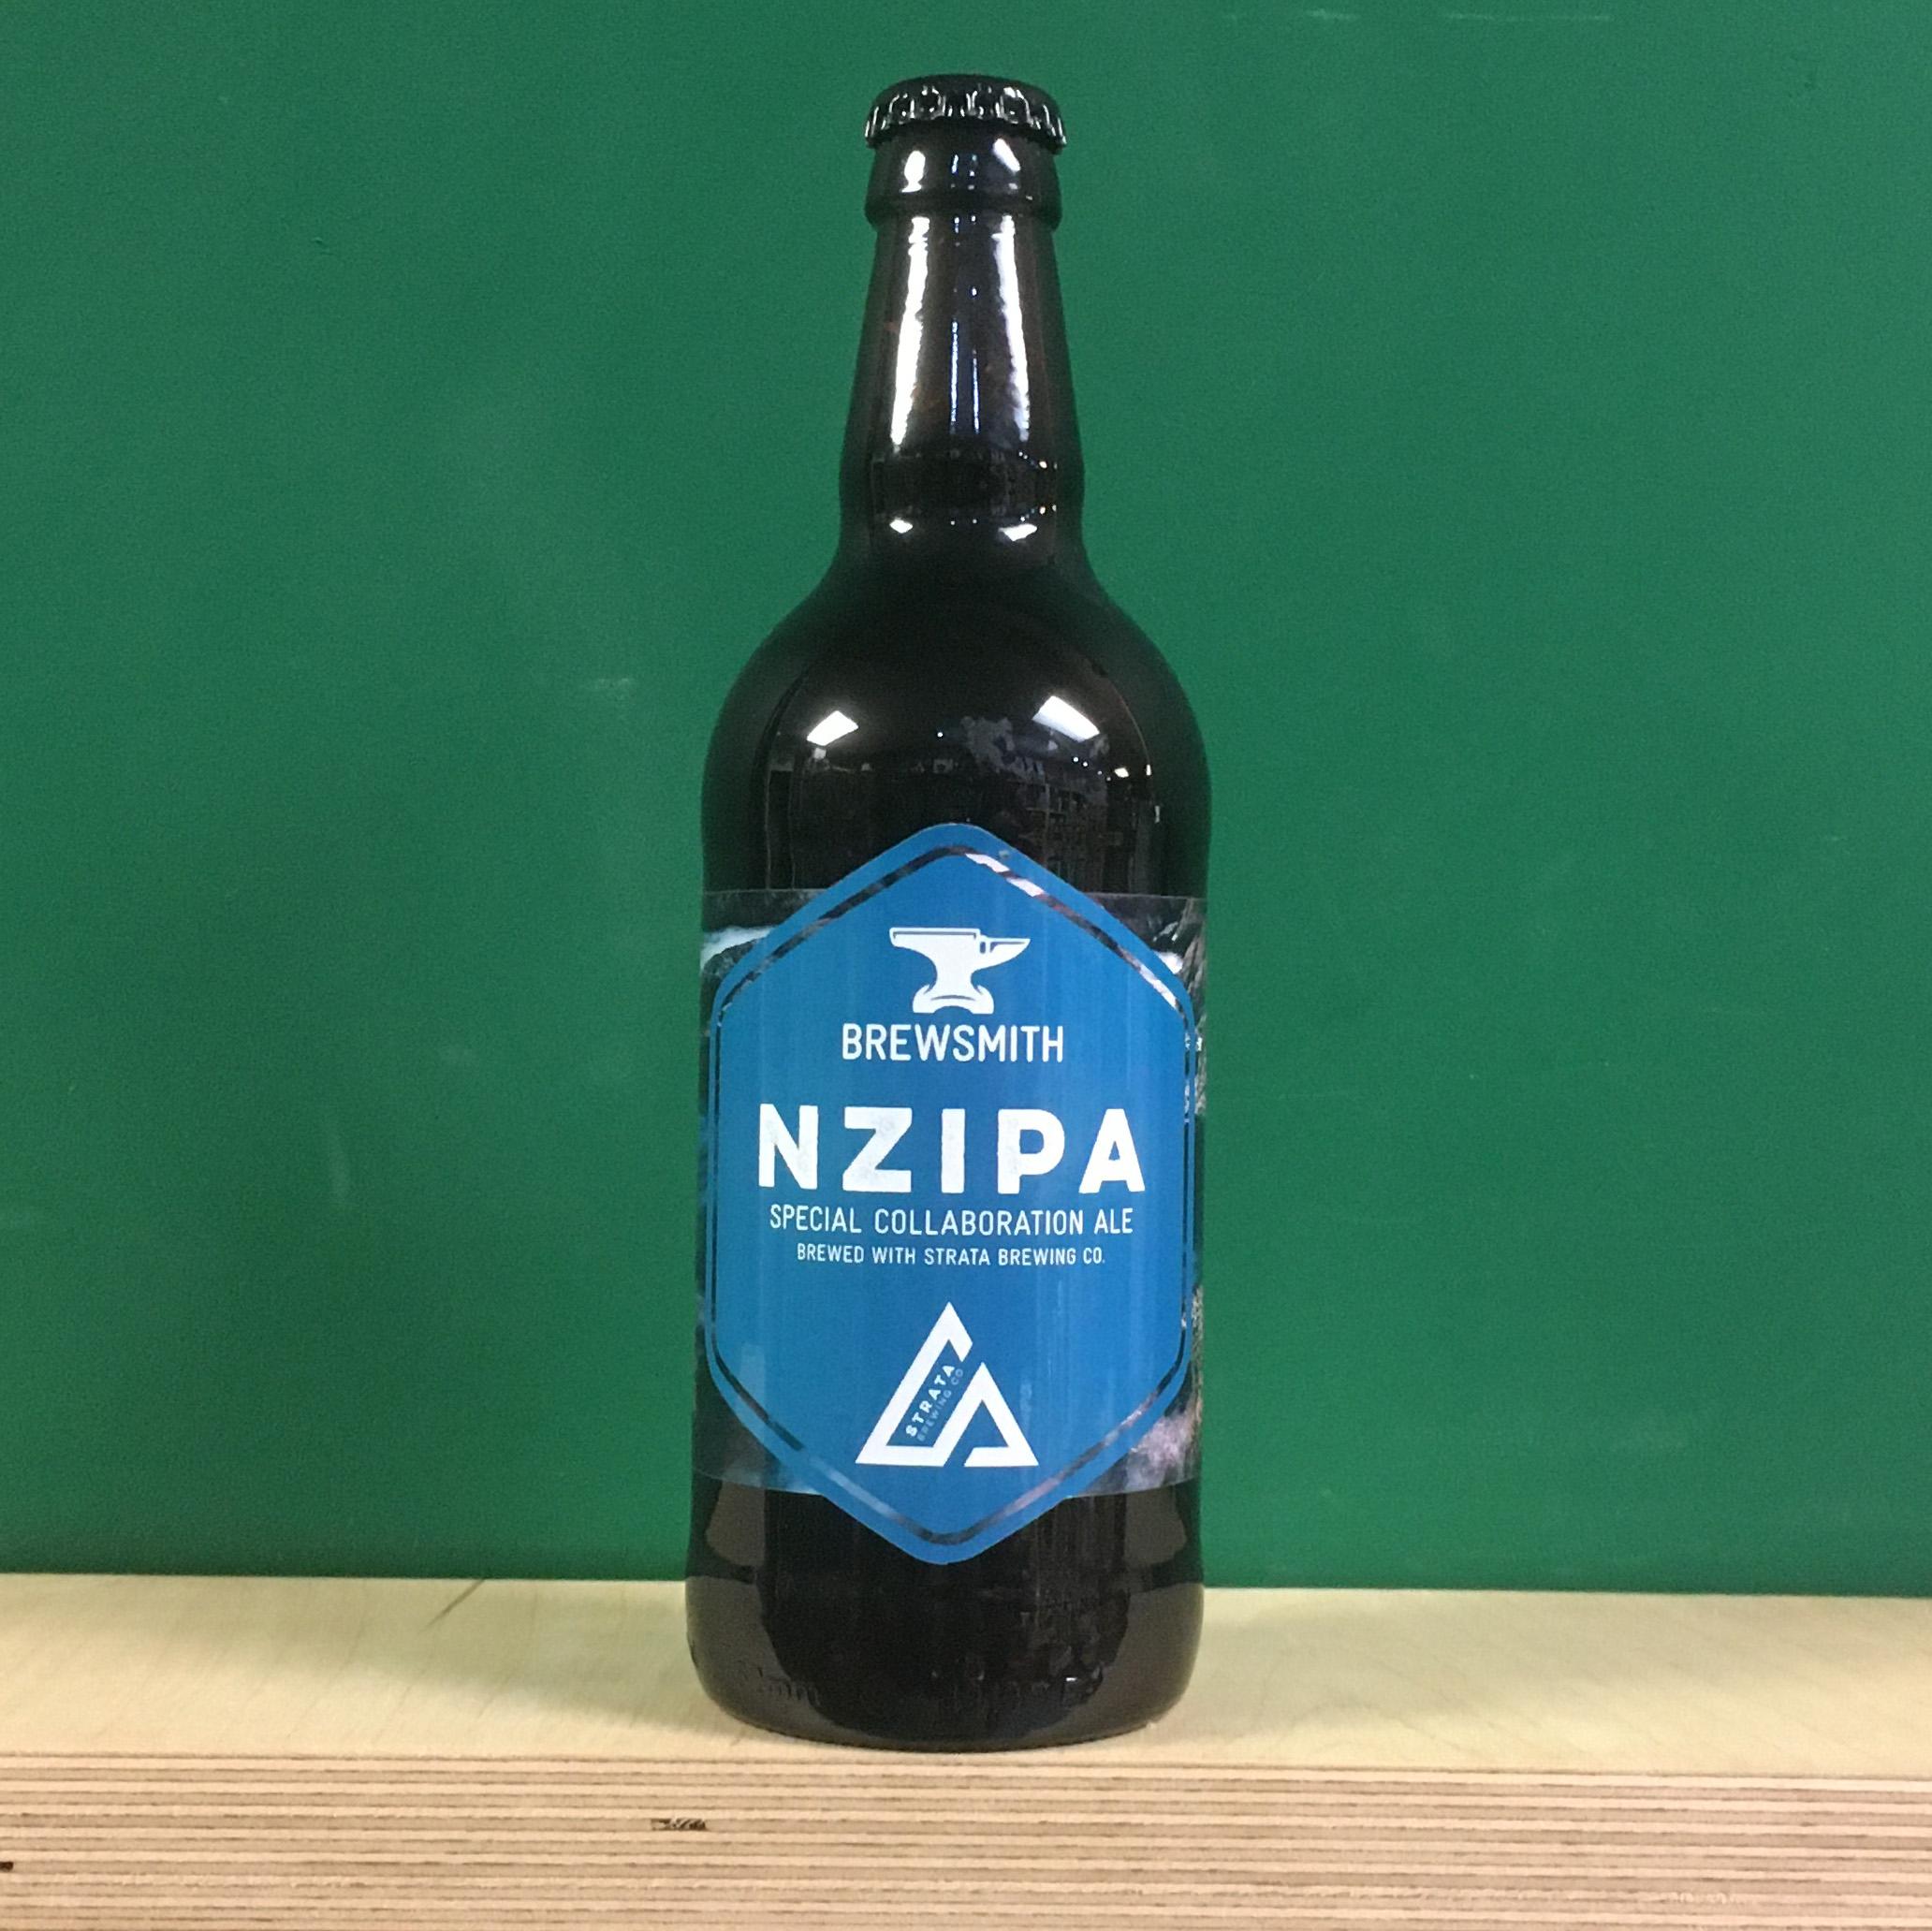 Brewsmith x Strata Brewing Co. NZIPA